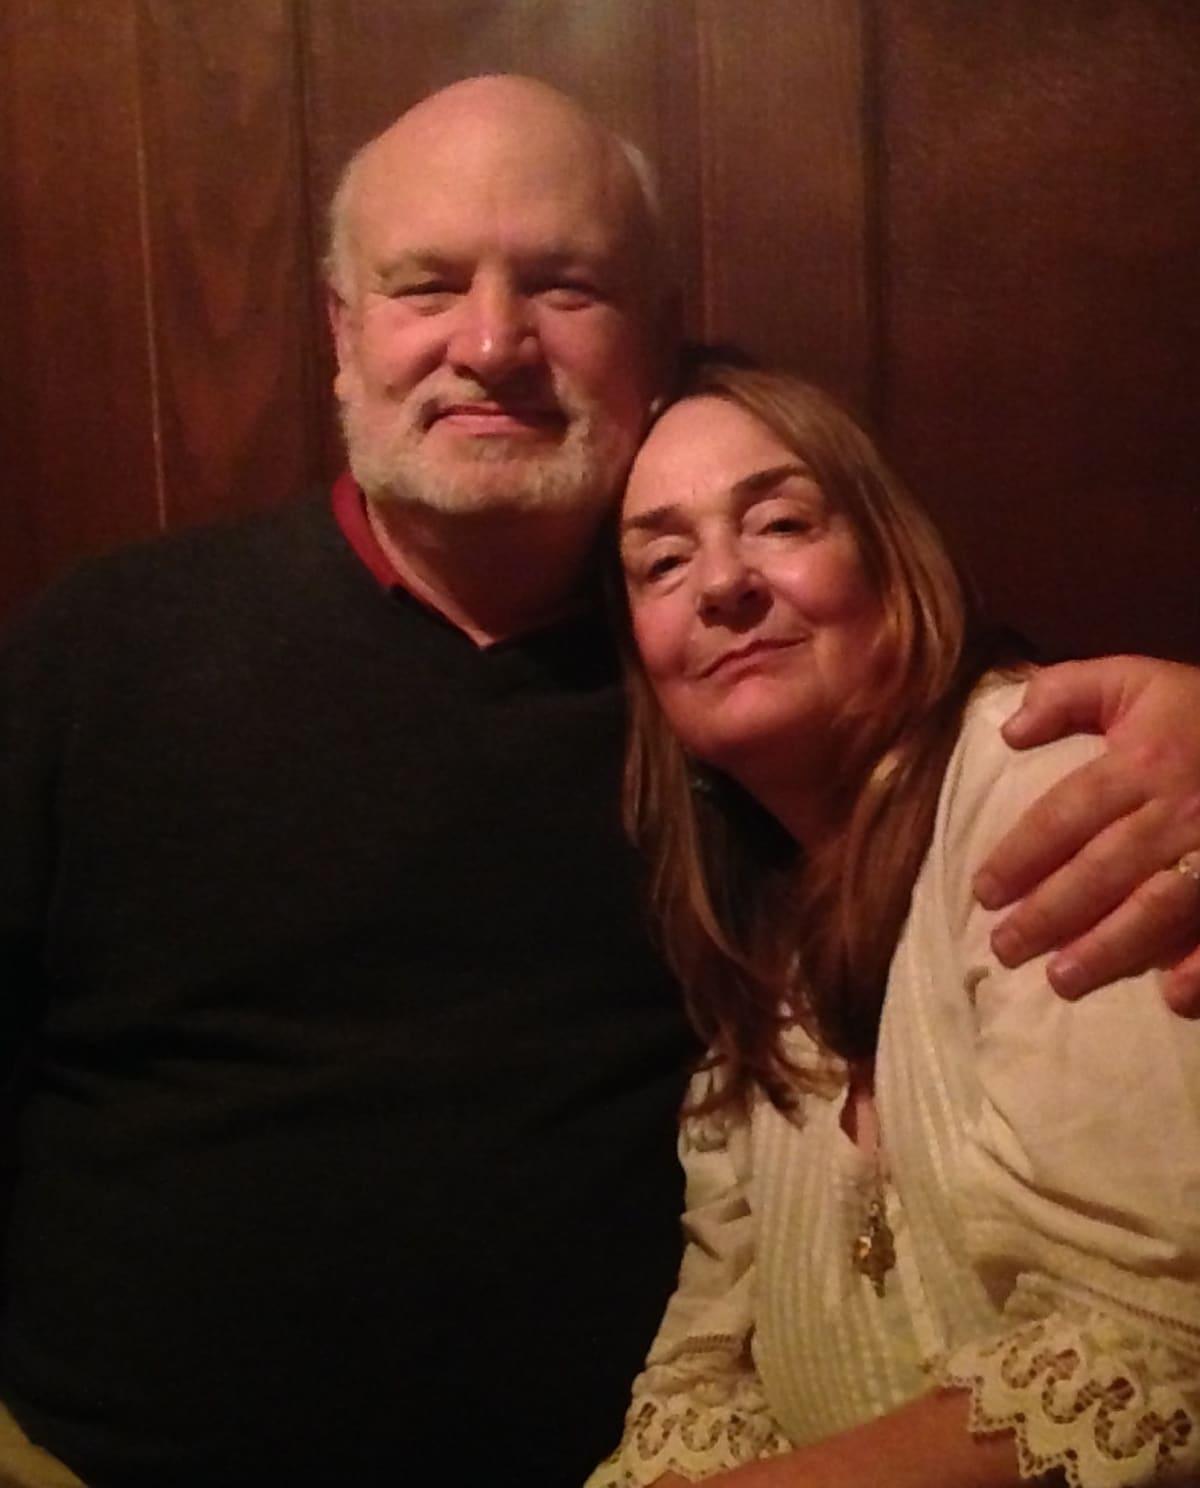 Steven & Julie from Malibu